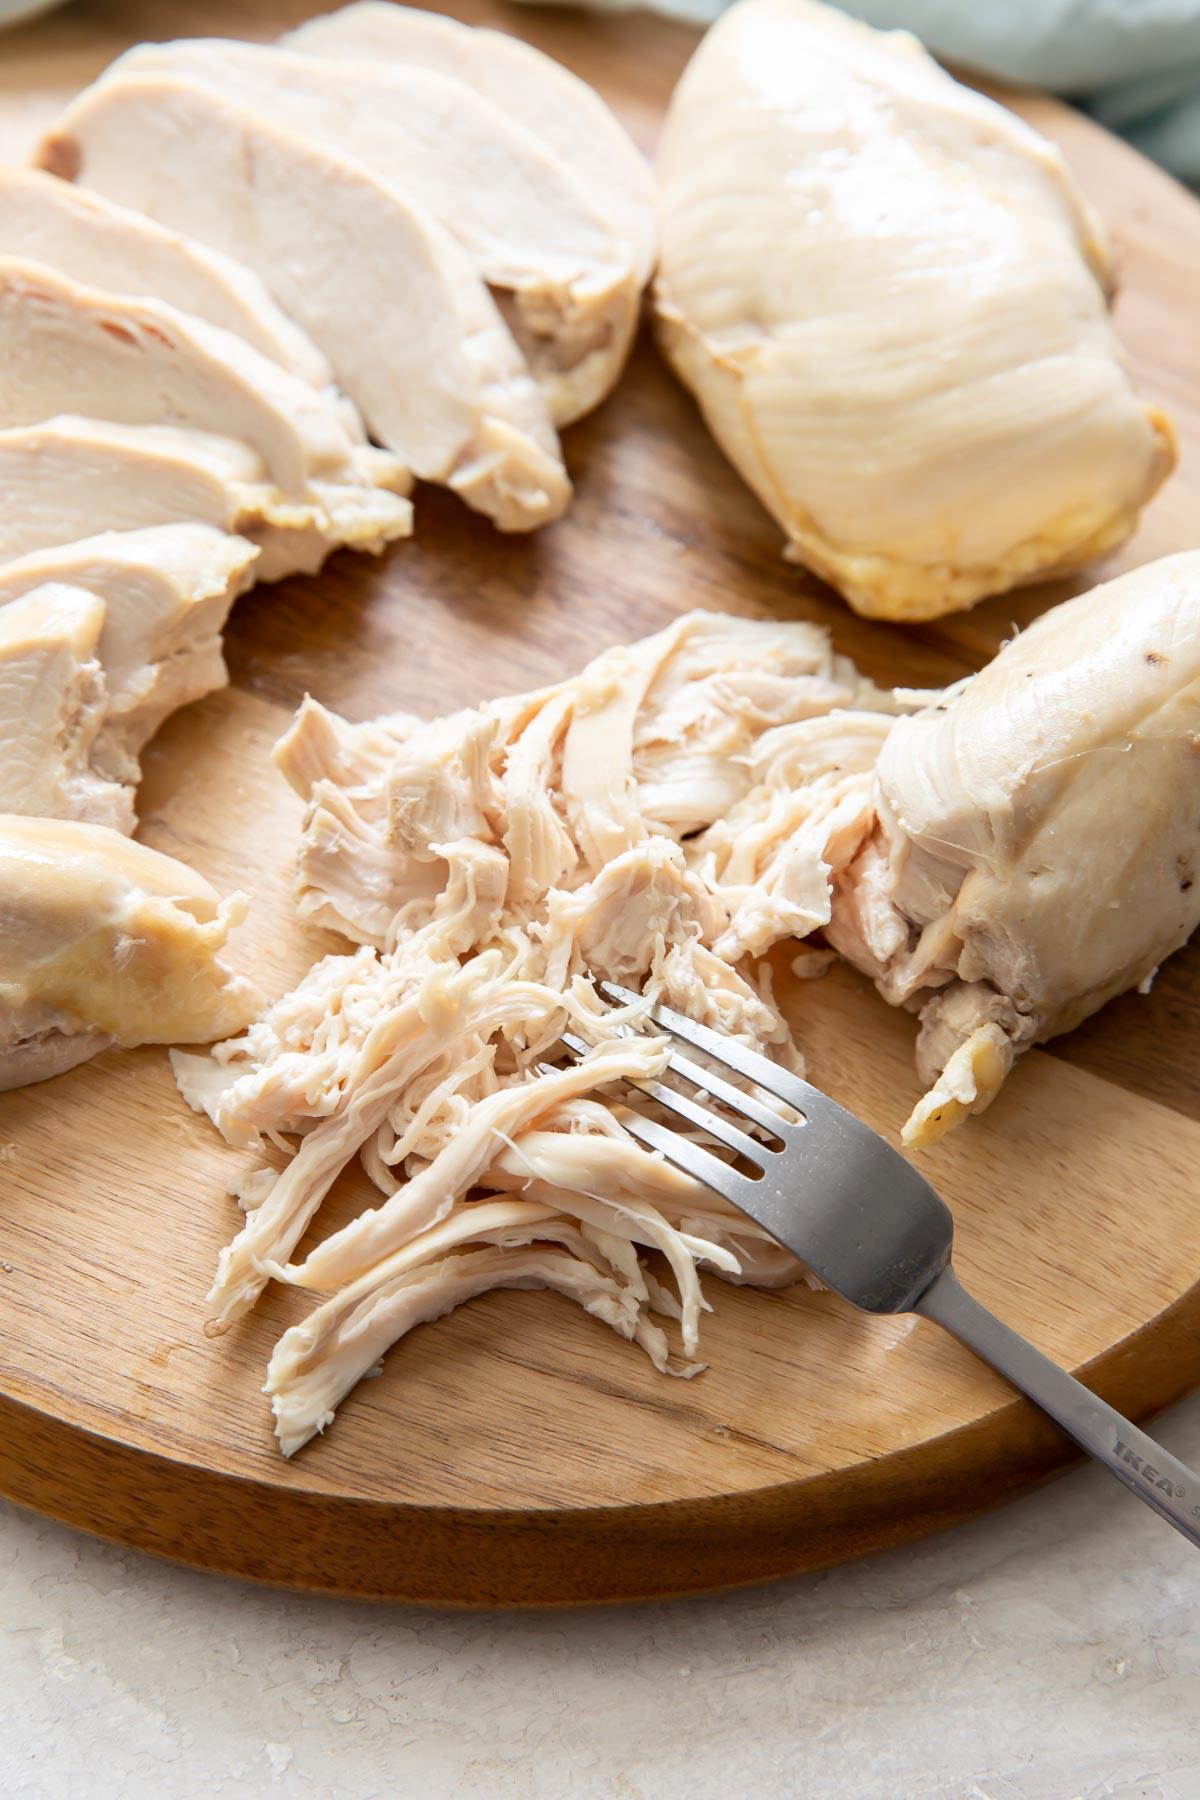 partially shredded chicken breast with sliced chicken in background